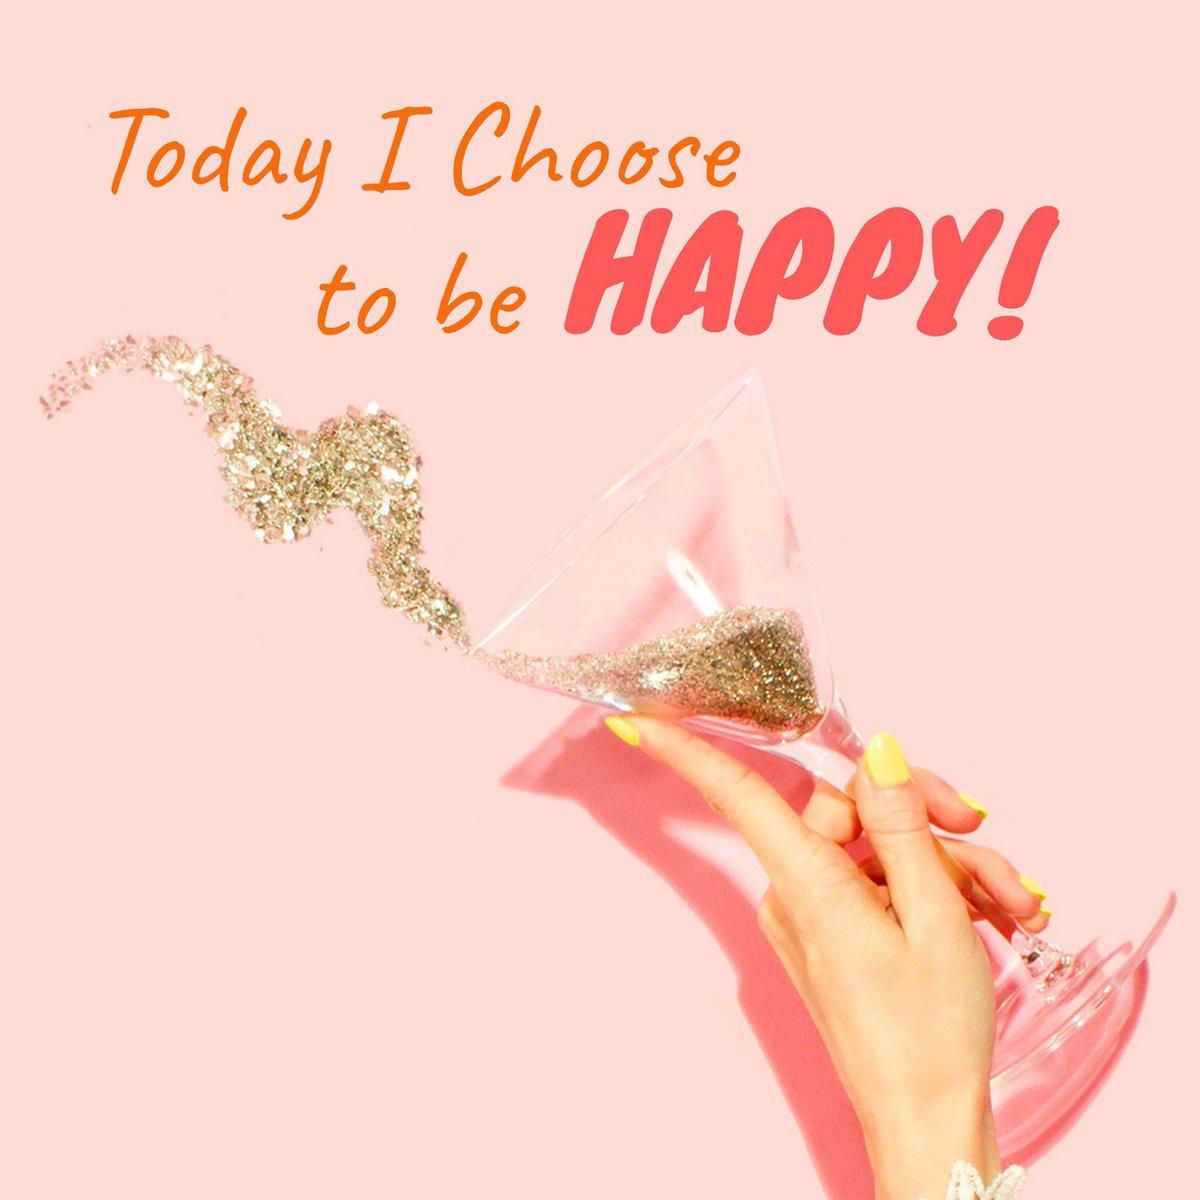 #goodmorningpost #amazing #igers #picoftheday #instadaily #instagood #bestoftheday #instacool #creative #joyvibes #positiveenergy #motivation #happylife #happymind #positivethoughts #changeisgood #changeyourlife #changeyourmindset #create #manifest https://t.co/FyJGgPKSSf